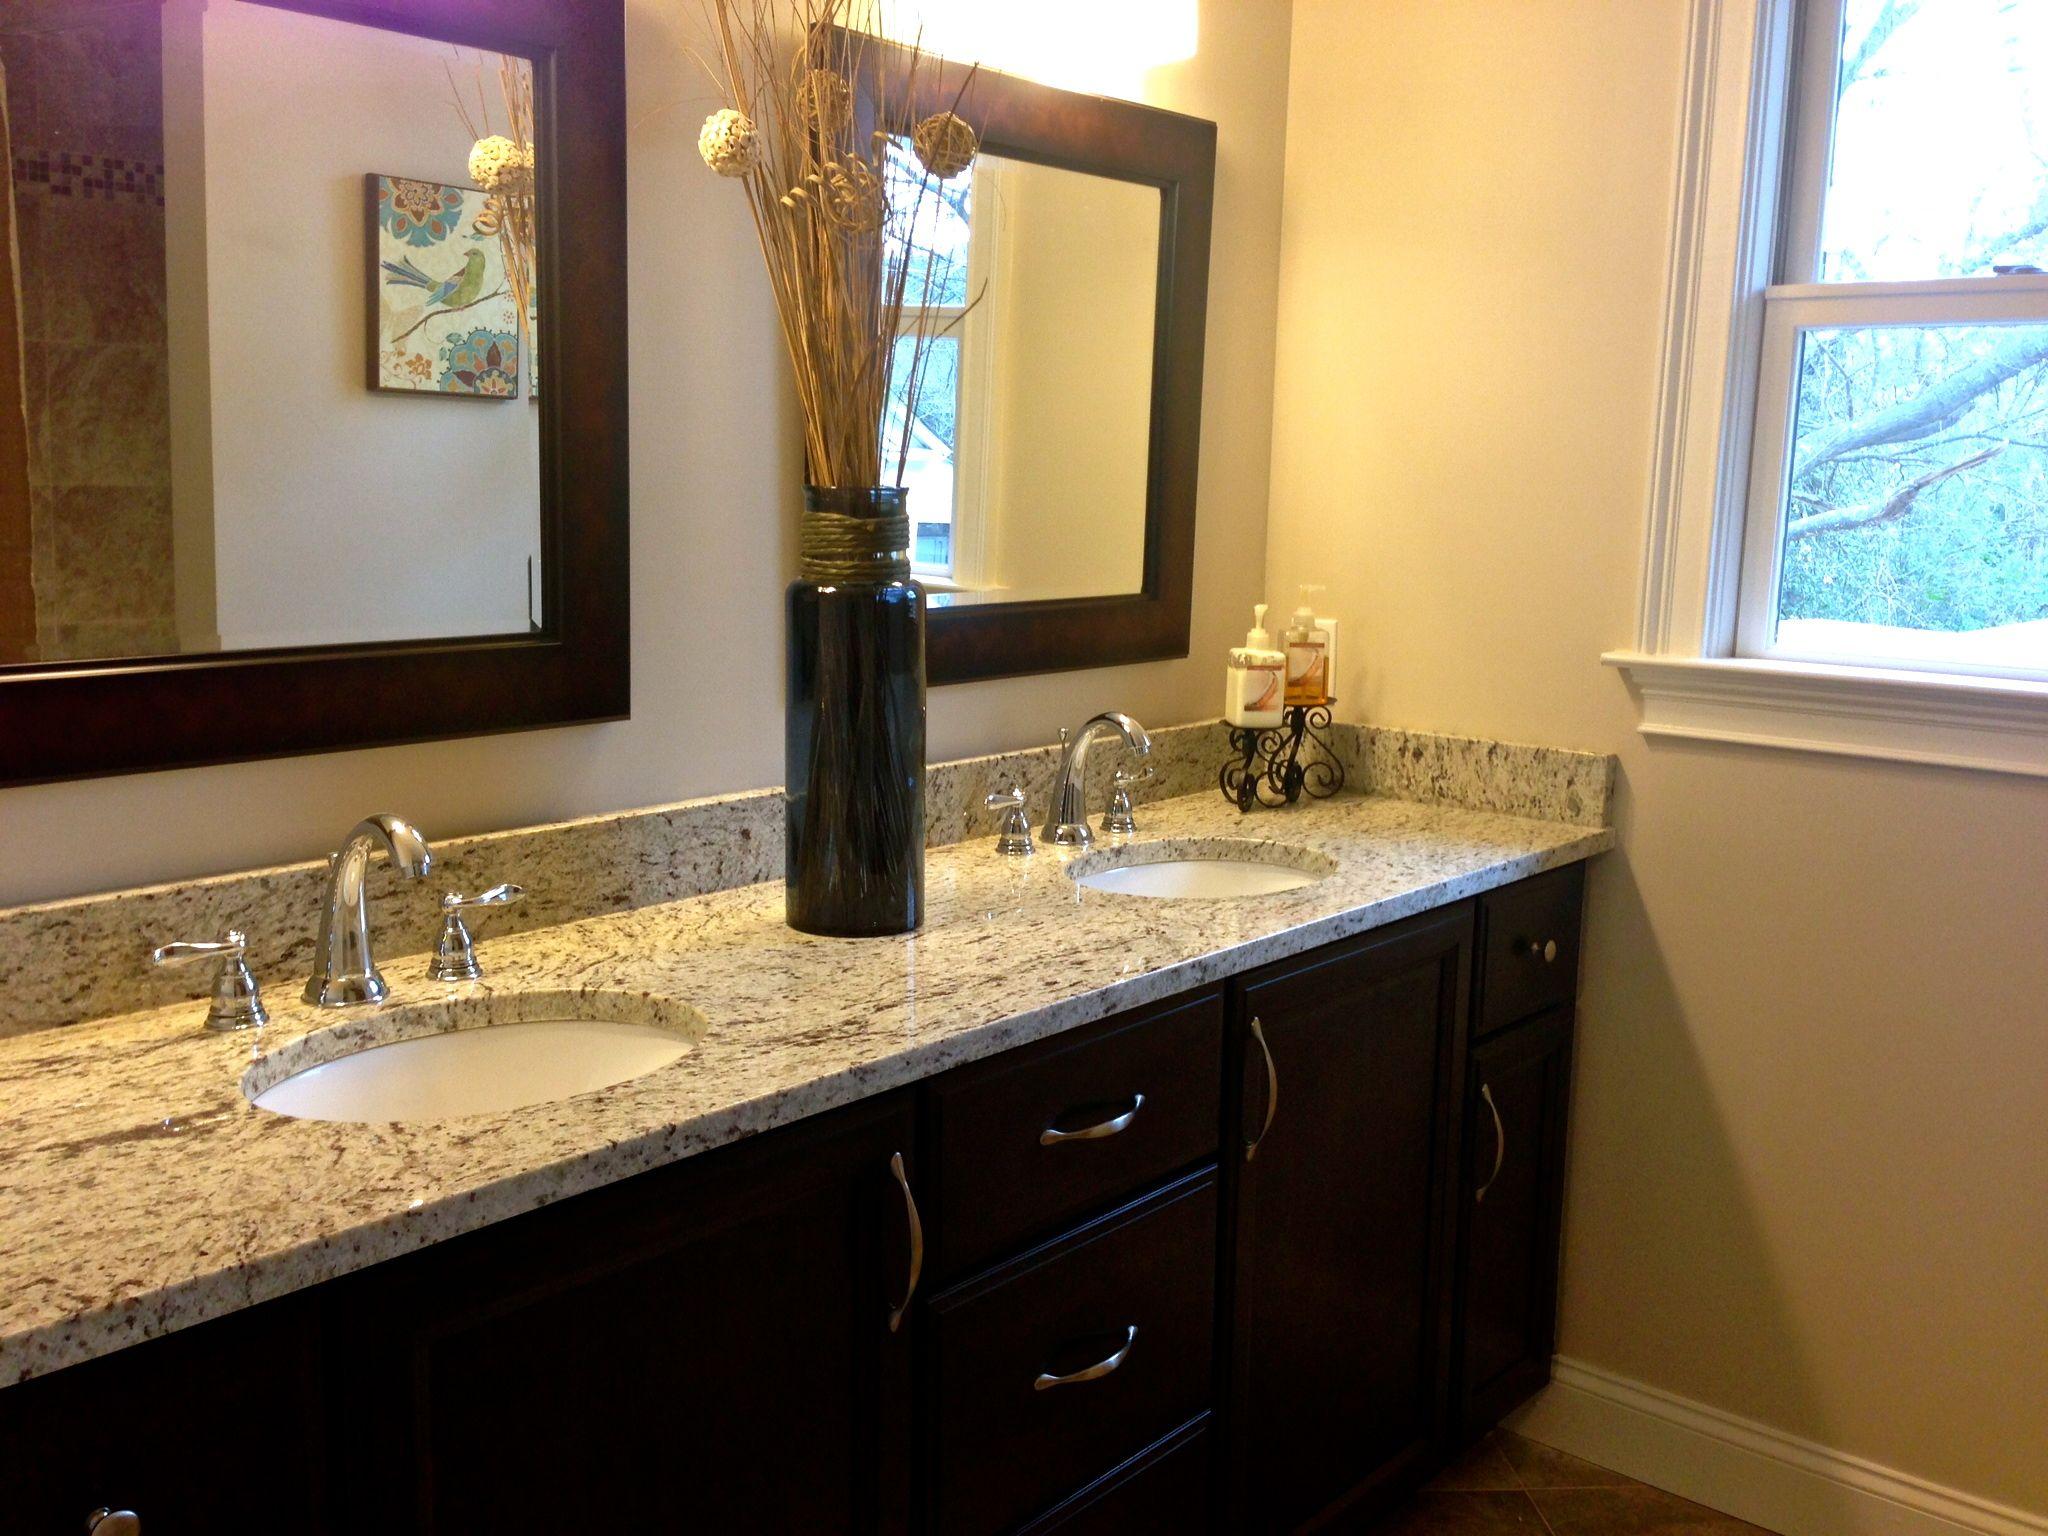 Shared Upstairs Bathroom Double Vanity Double Sinks Granite